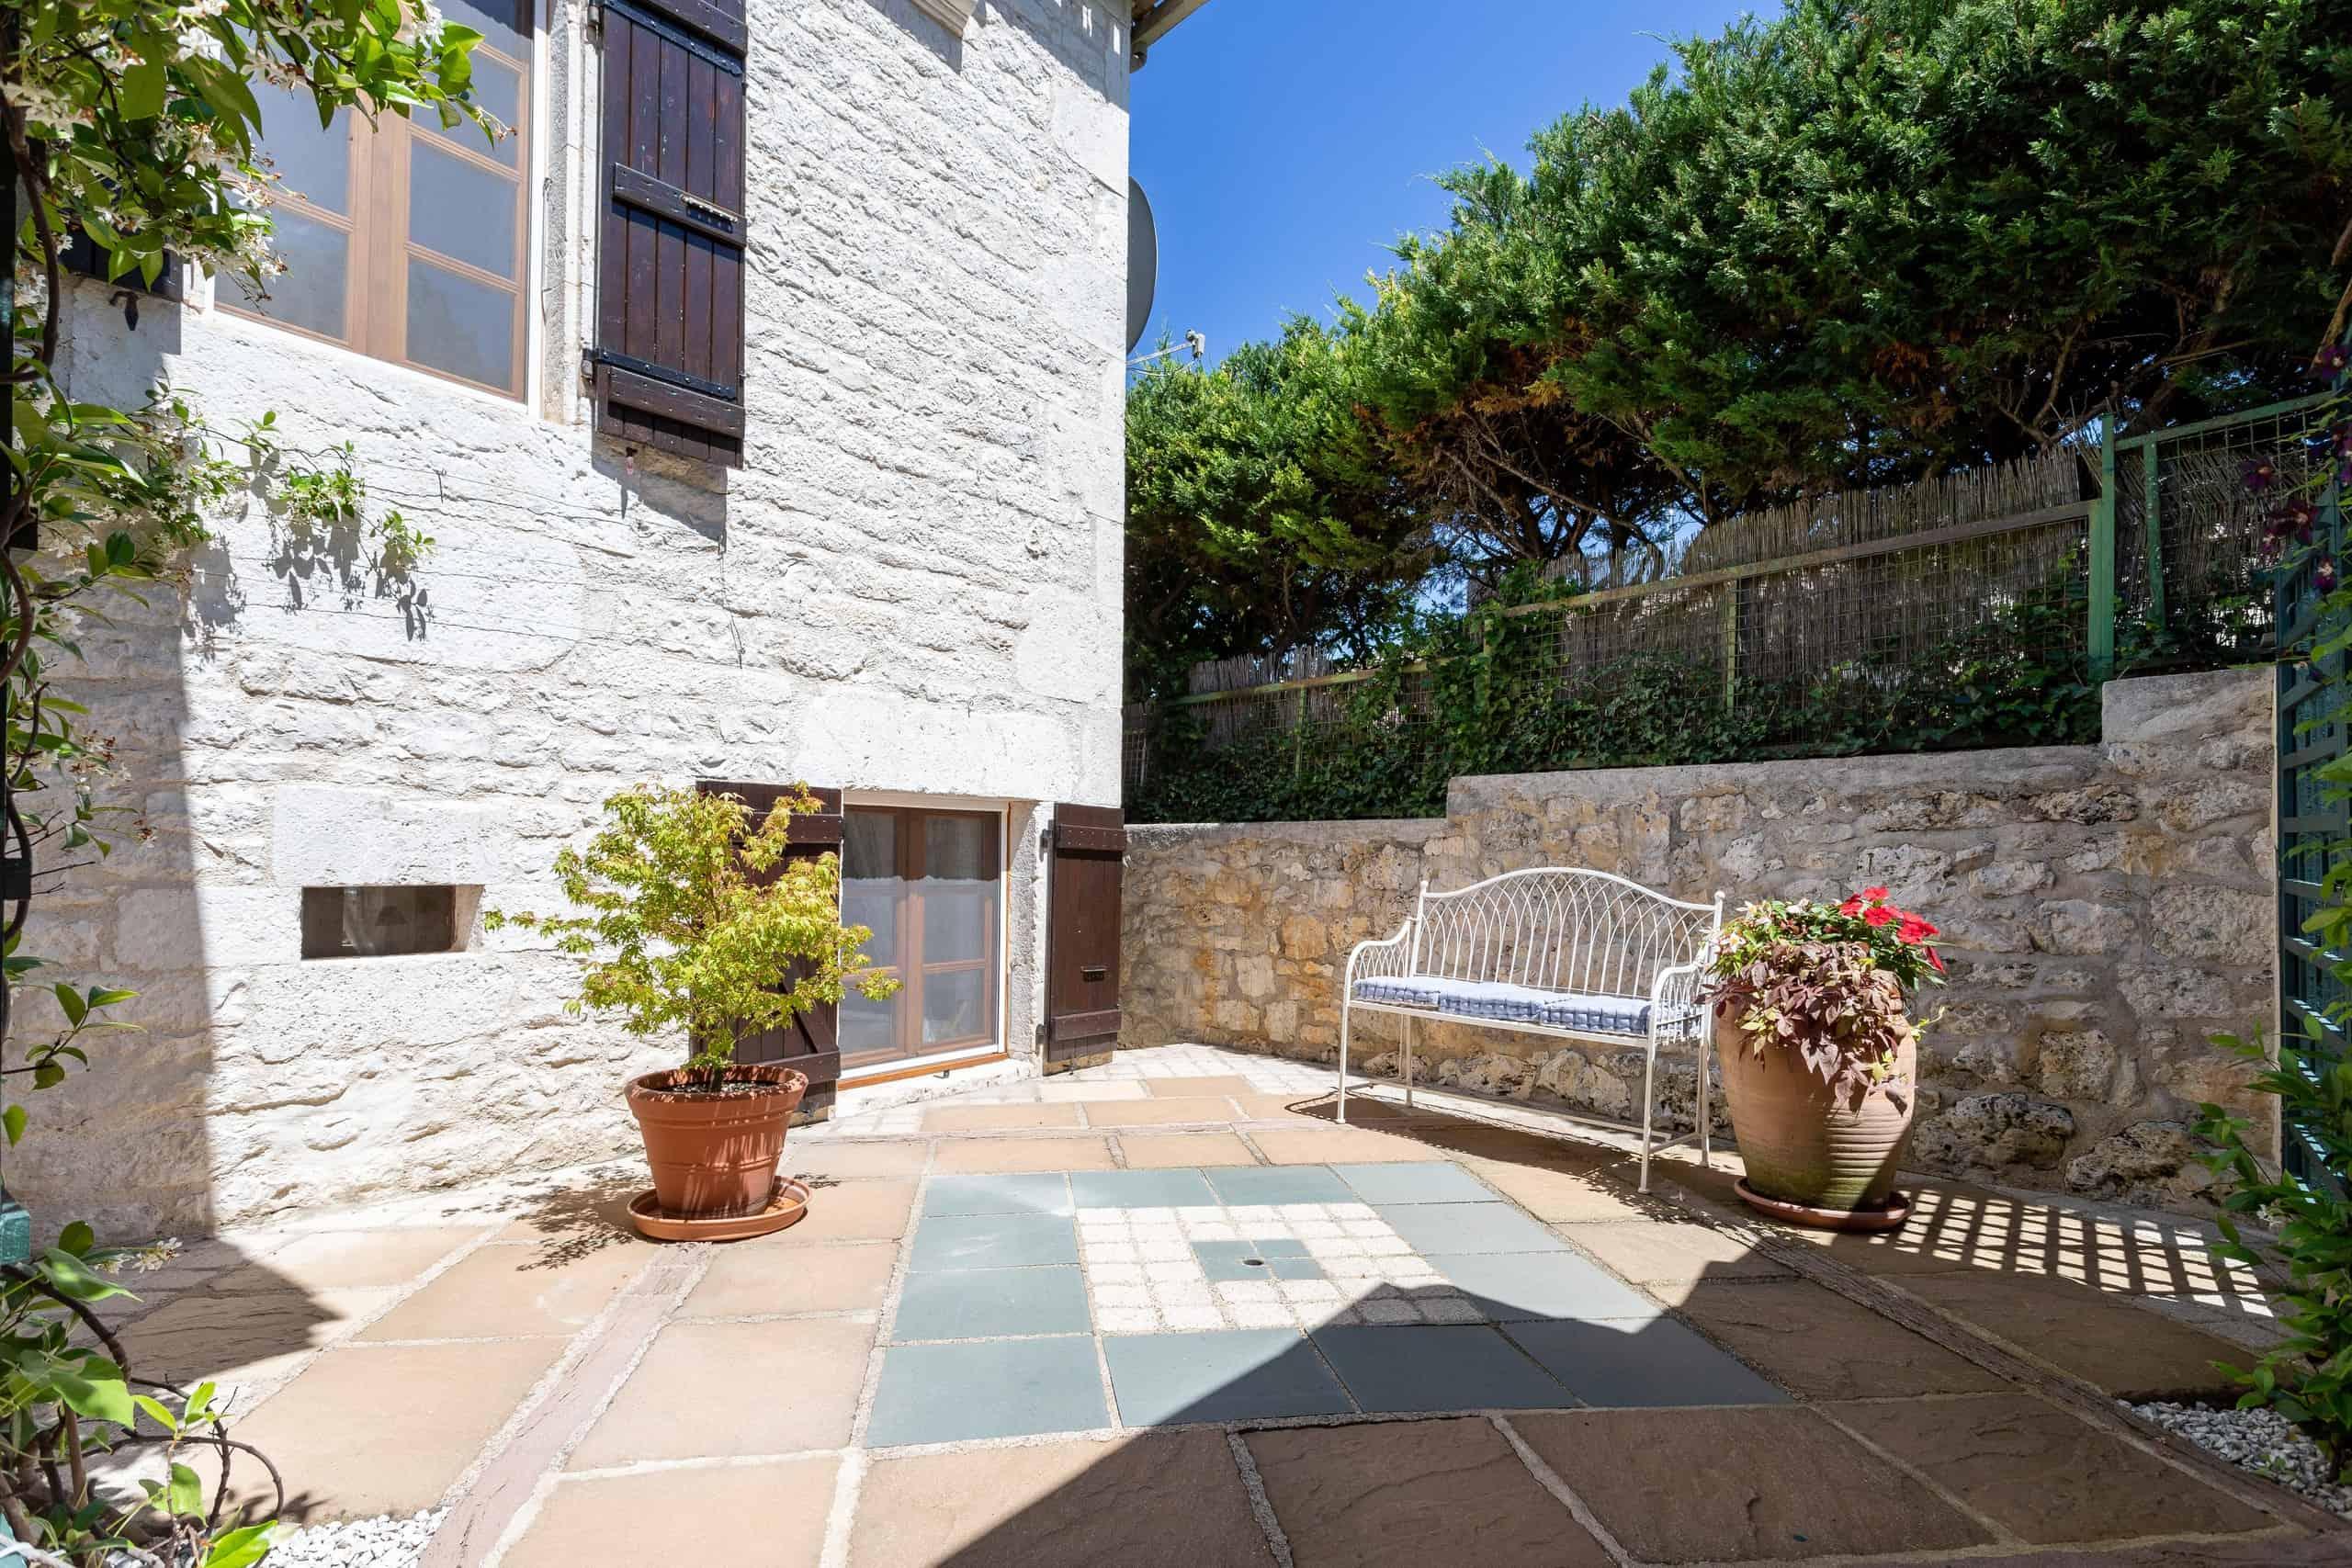 Courtyard-WMC083